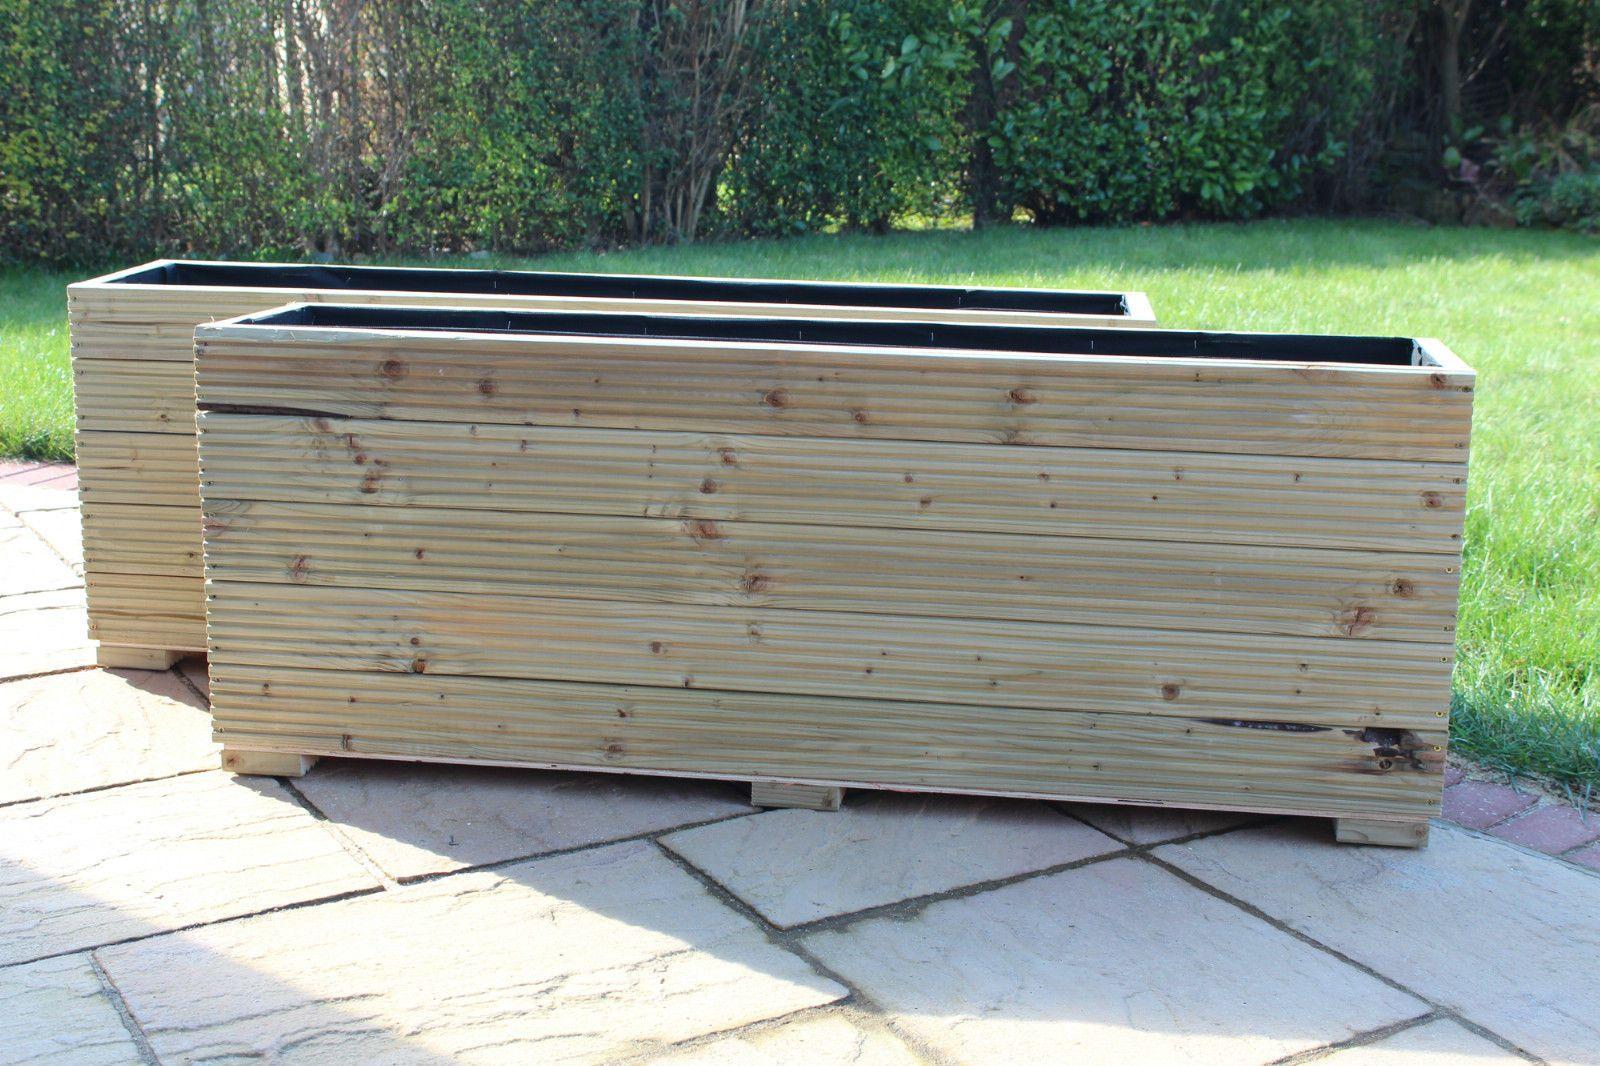 details about large wooden garden planter trough 50cm soil. Black Bedroom Furniture Sets. Home Design Ideas